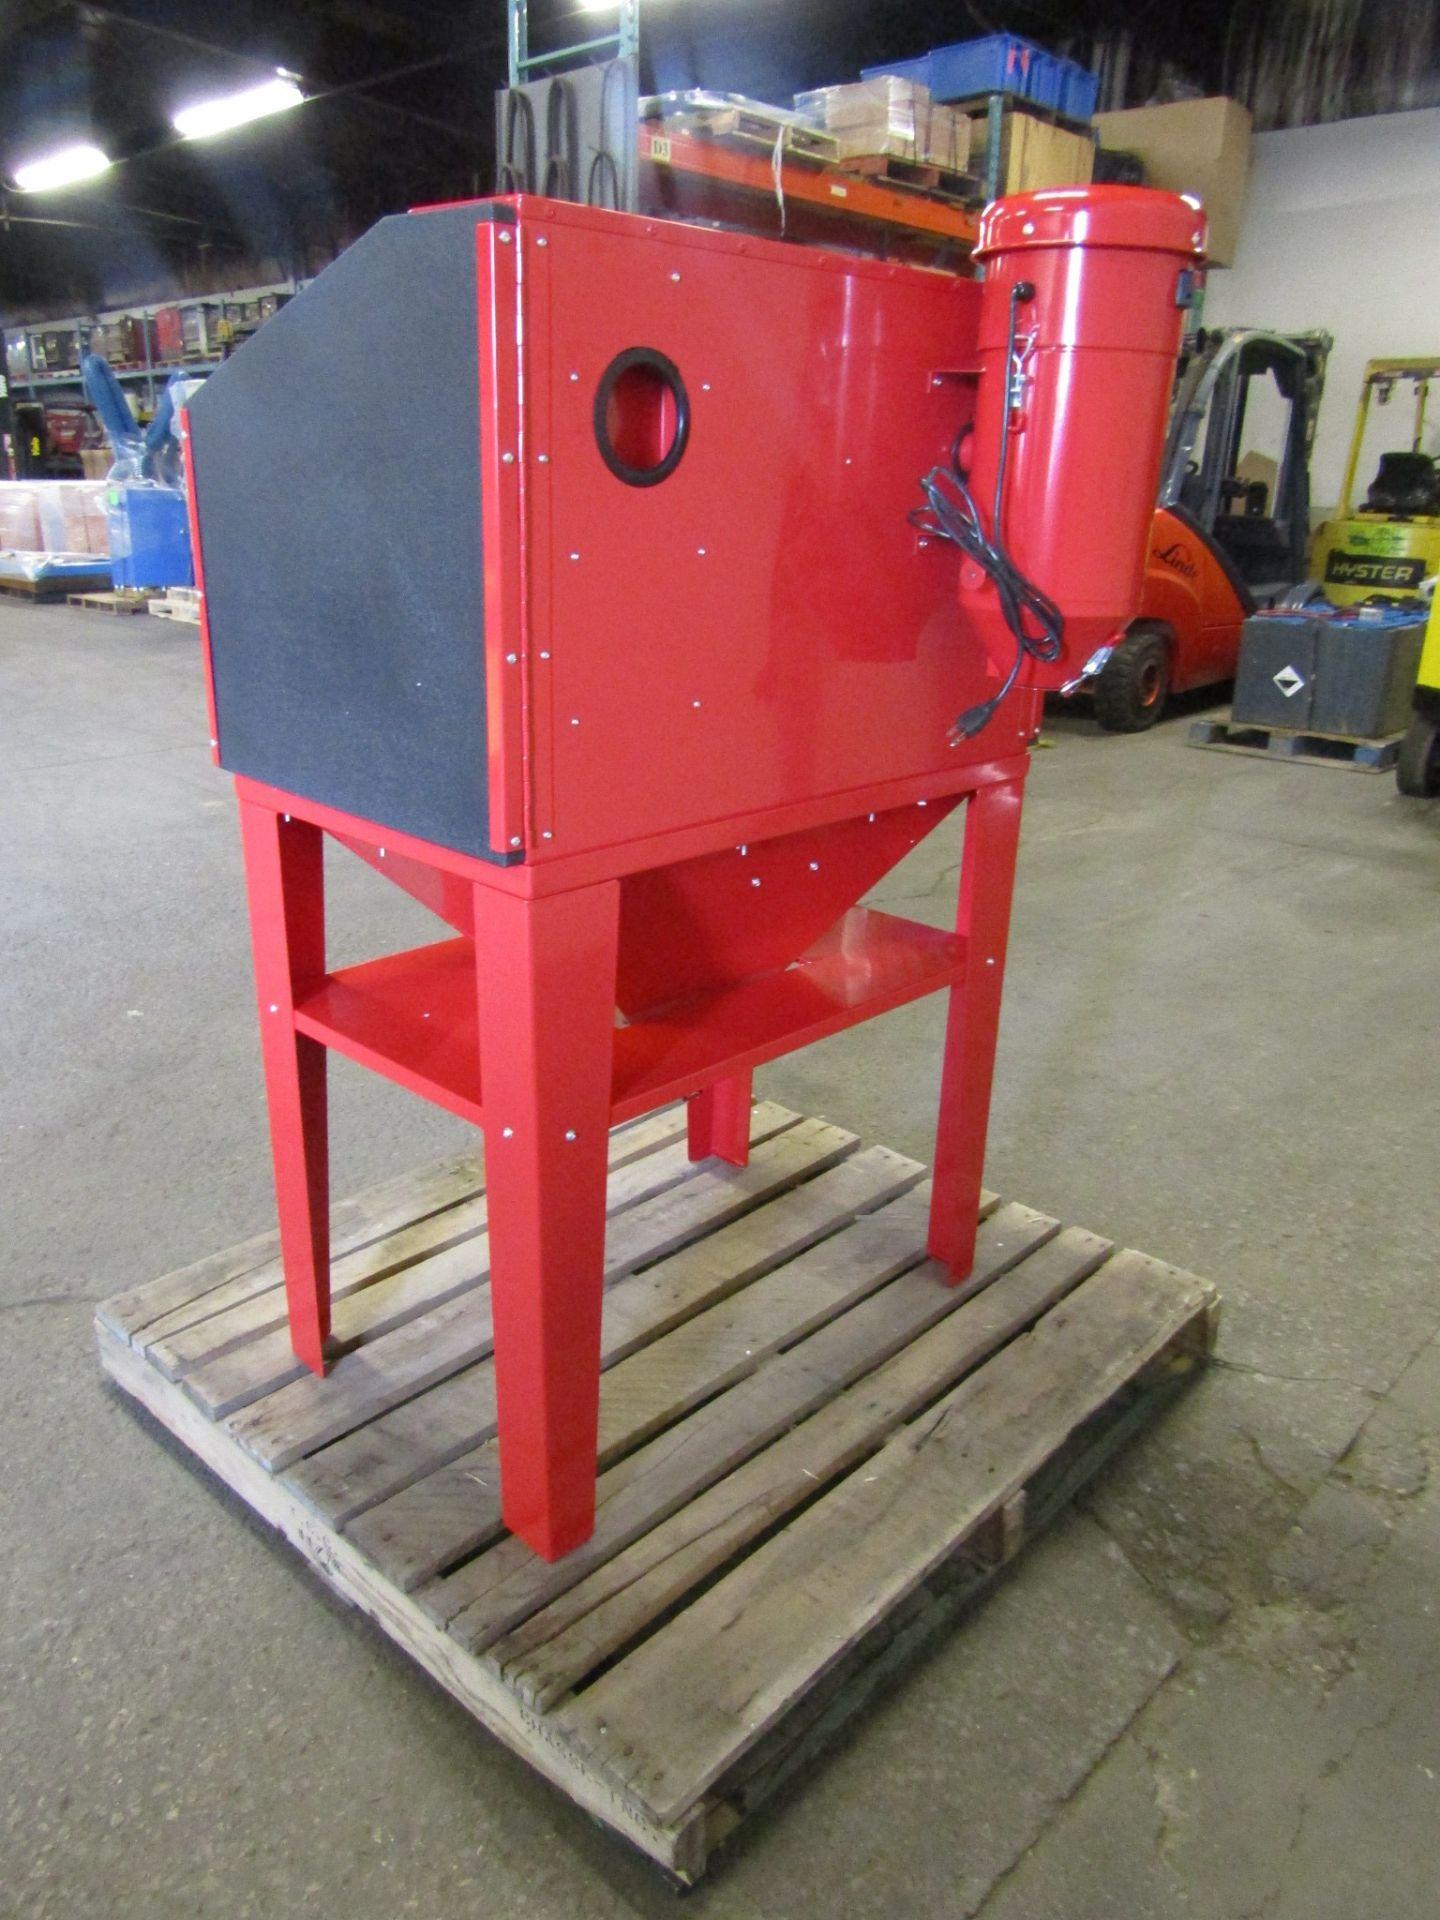 "Lot 270 - BRAND NEW OMNI Sandblast Cabinet with Dust vacuum unit - 125PSI working space 24"" X 33"" X 25"""